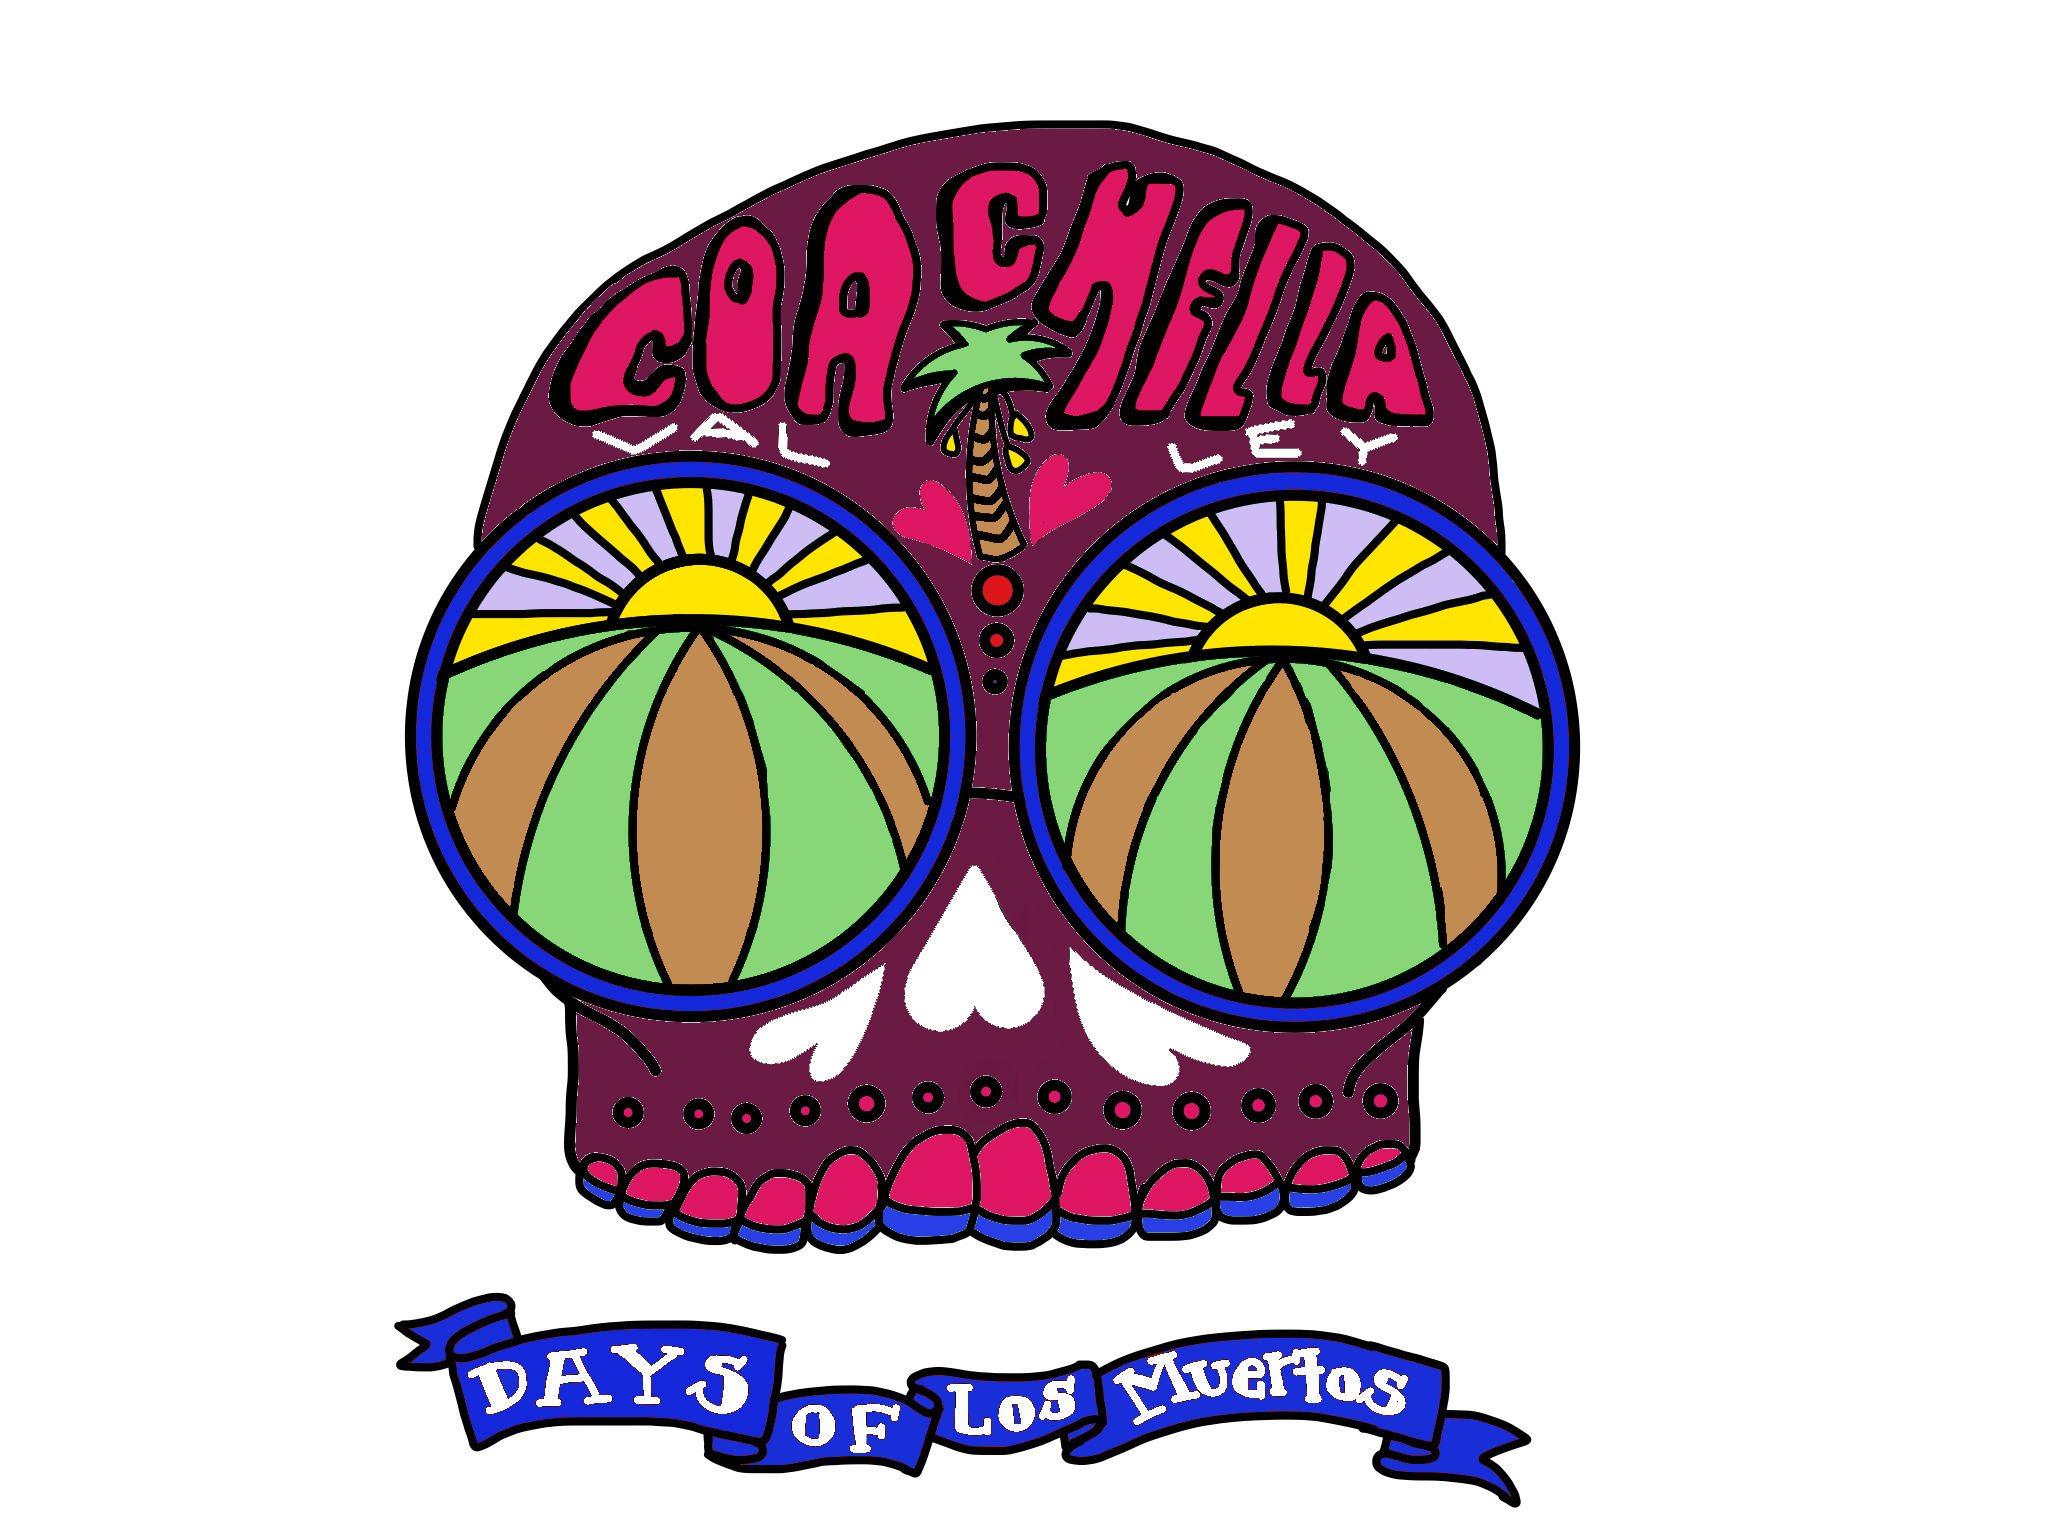 2048x1536 Sunnylands Unites With Coachella Cultural Organizations